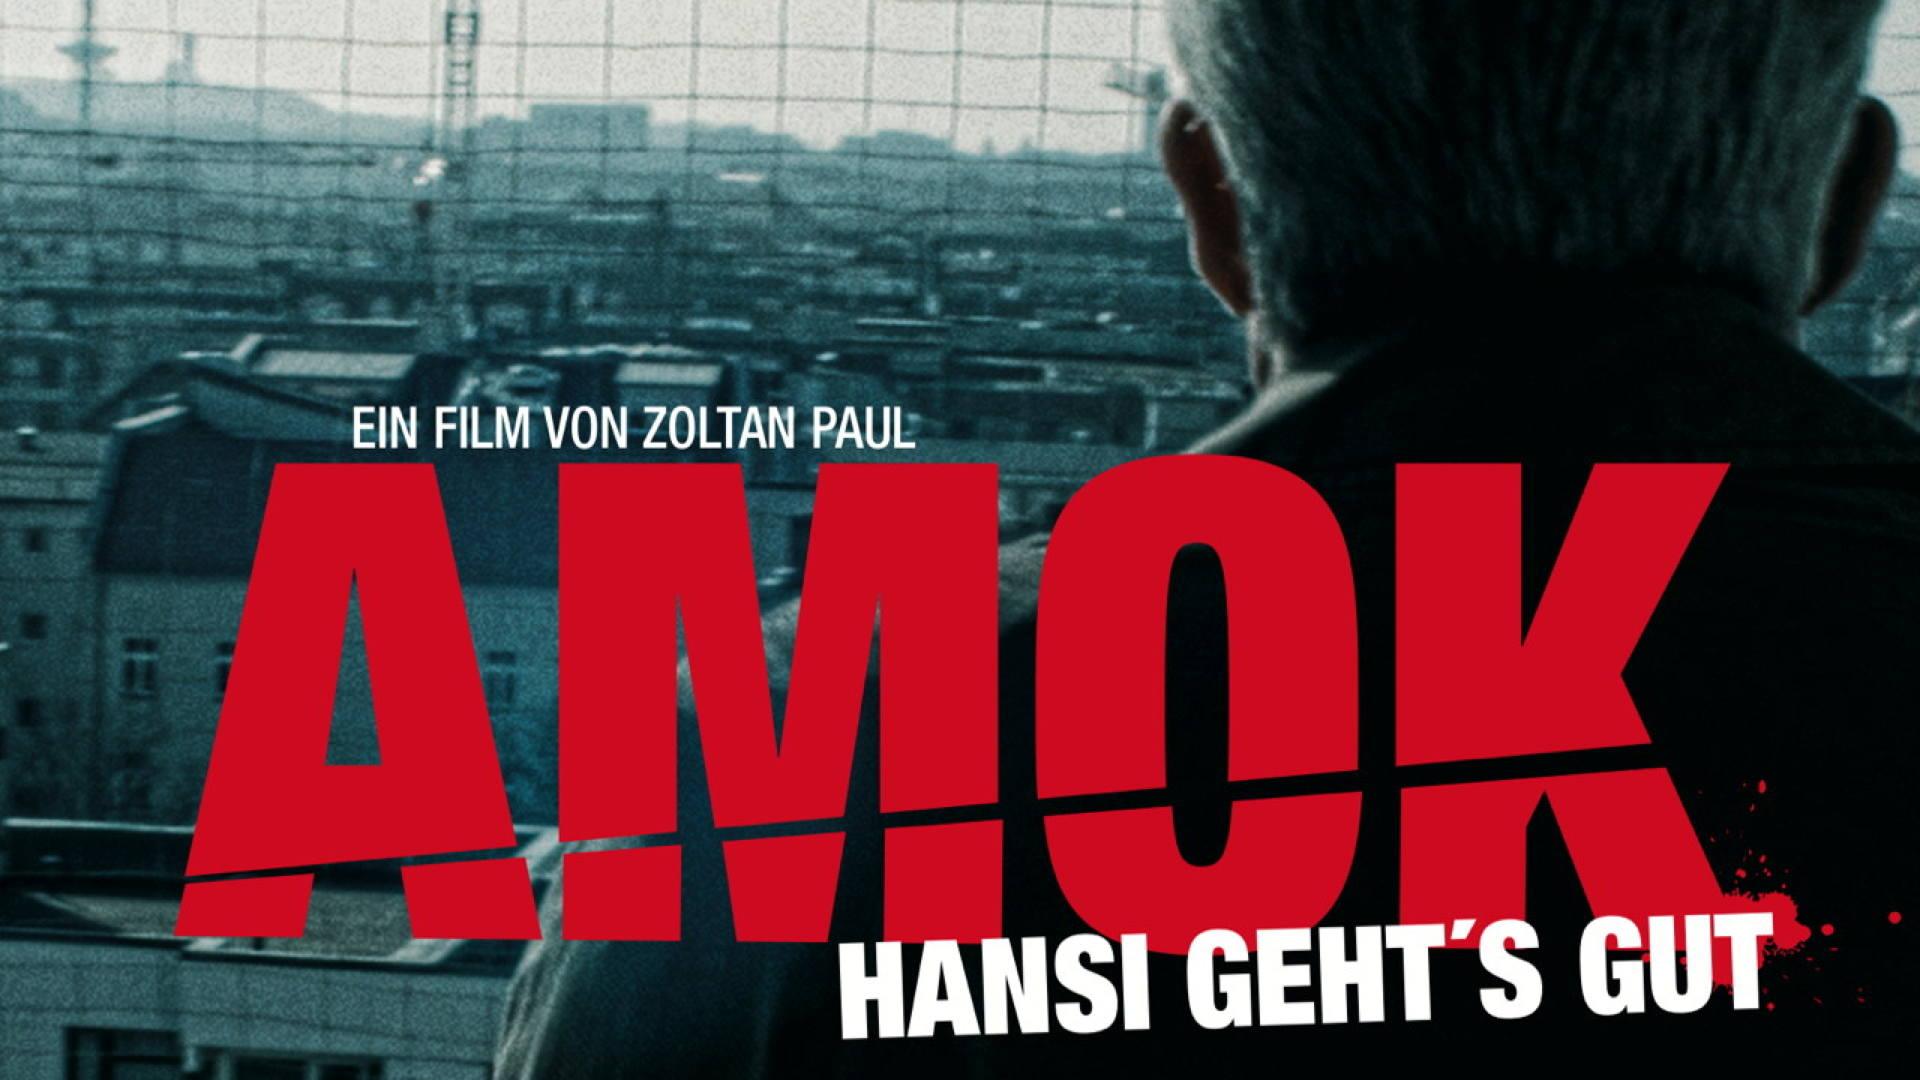 Amok - Hansi gehts gut on Amazon Prime Video UK